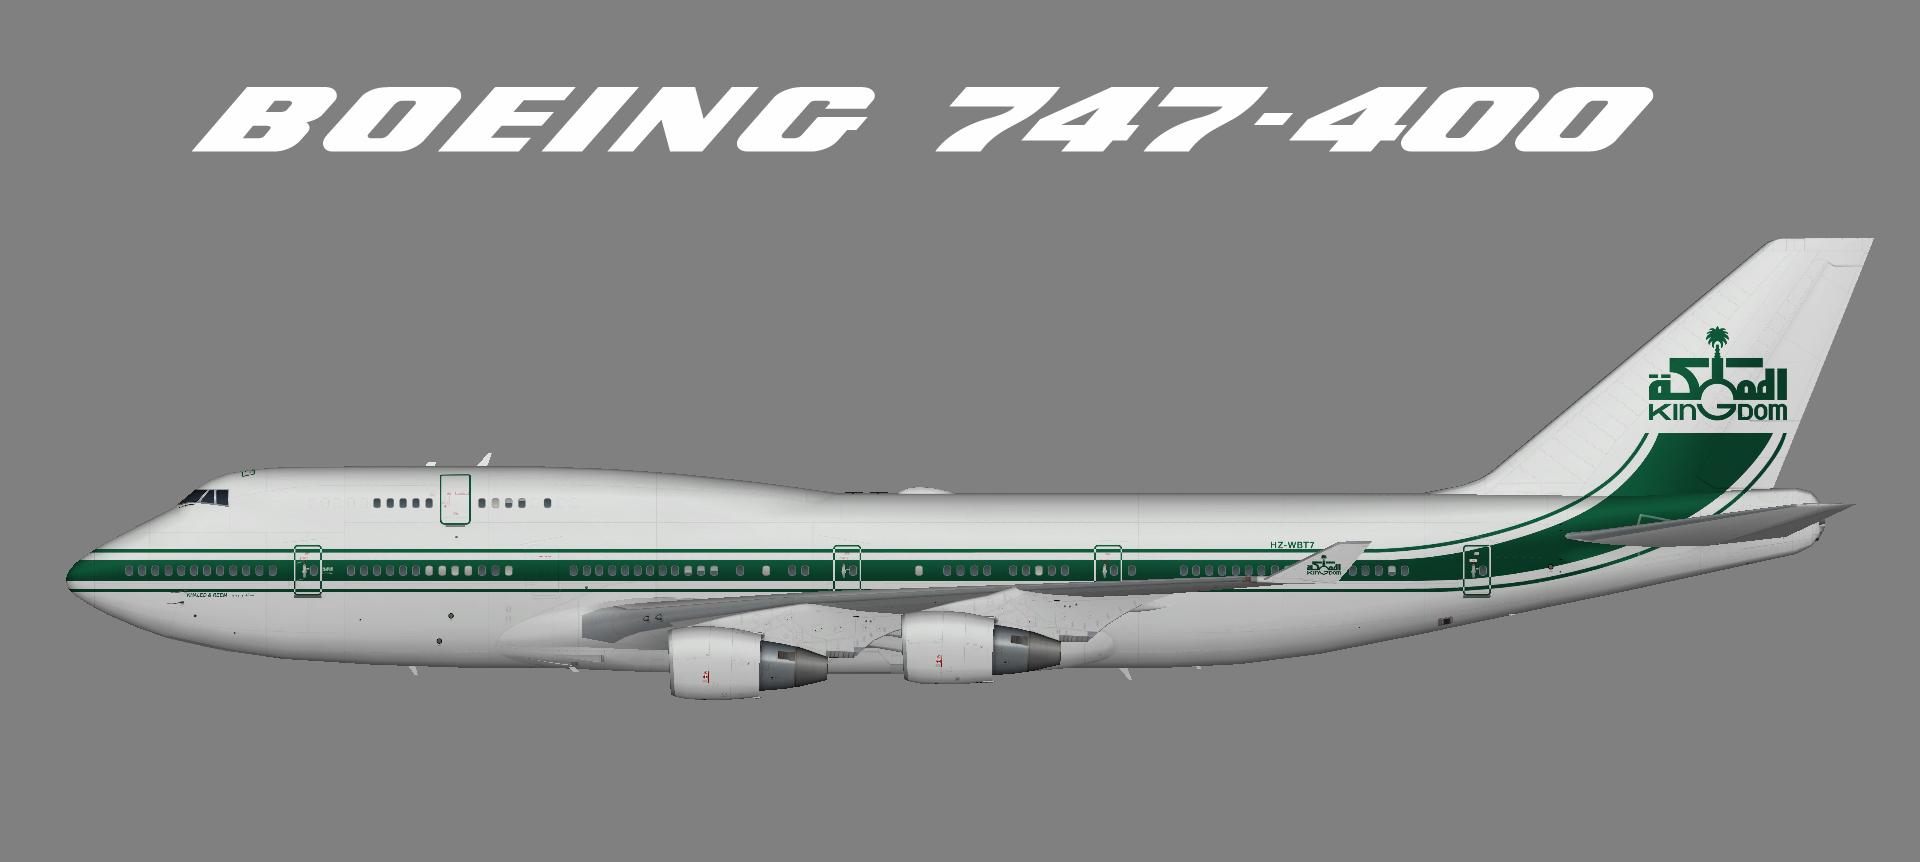 Kingdom Holding 747-400